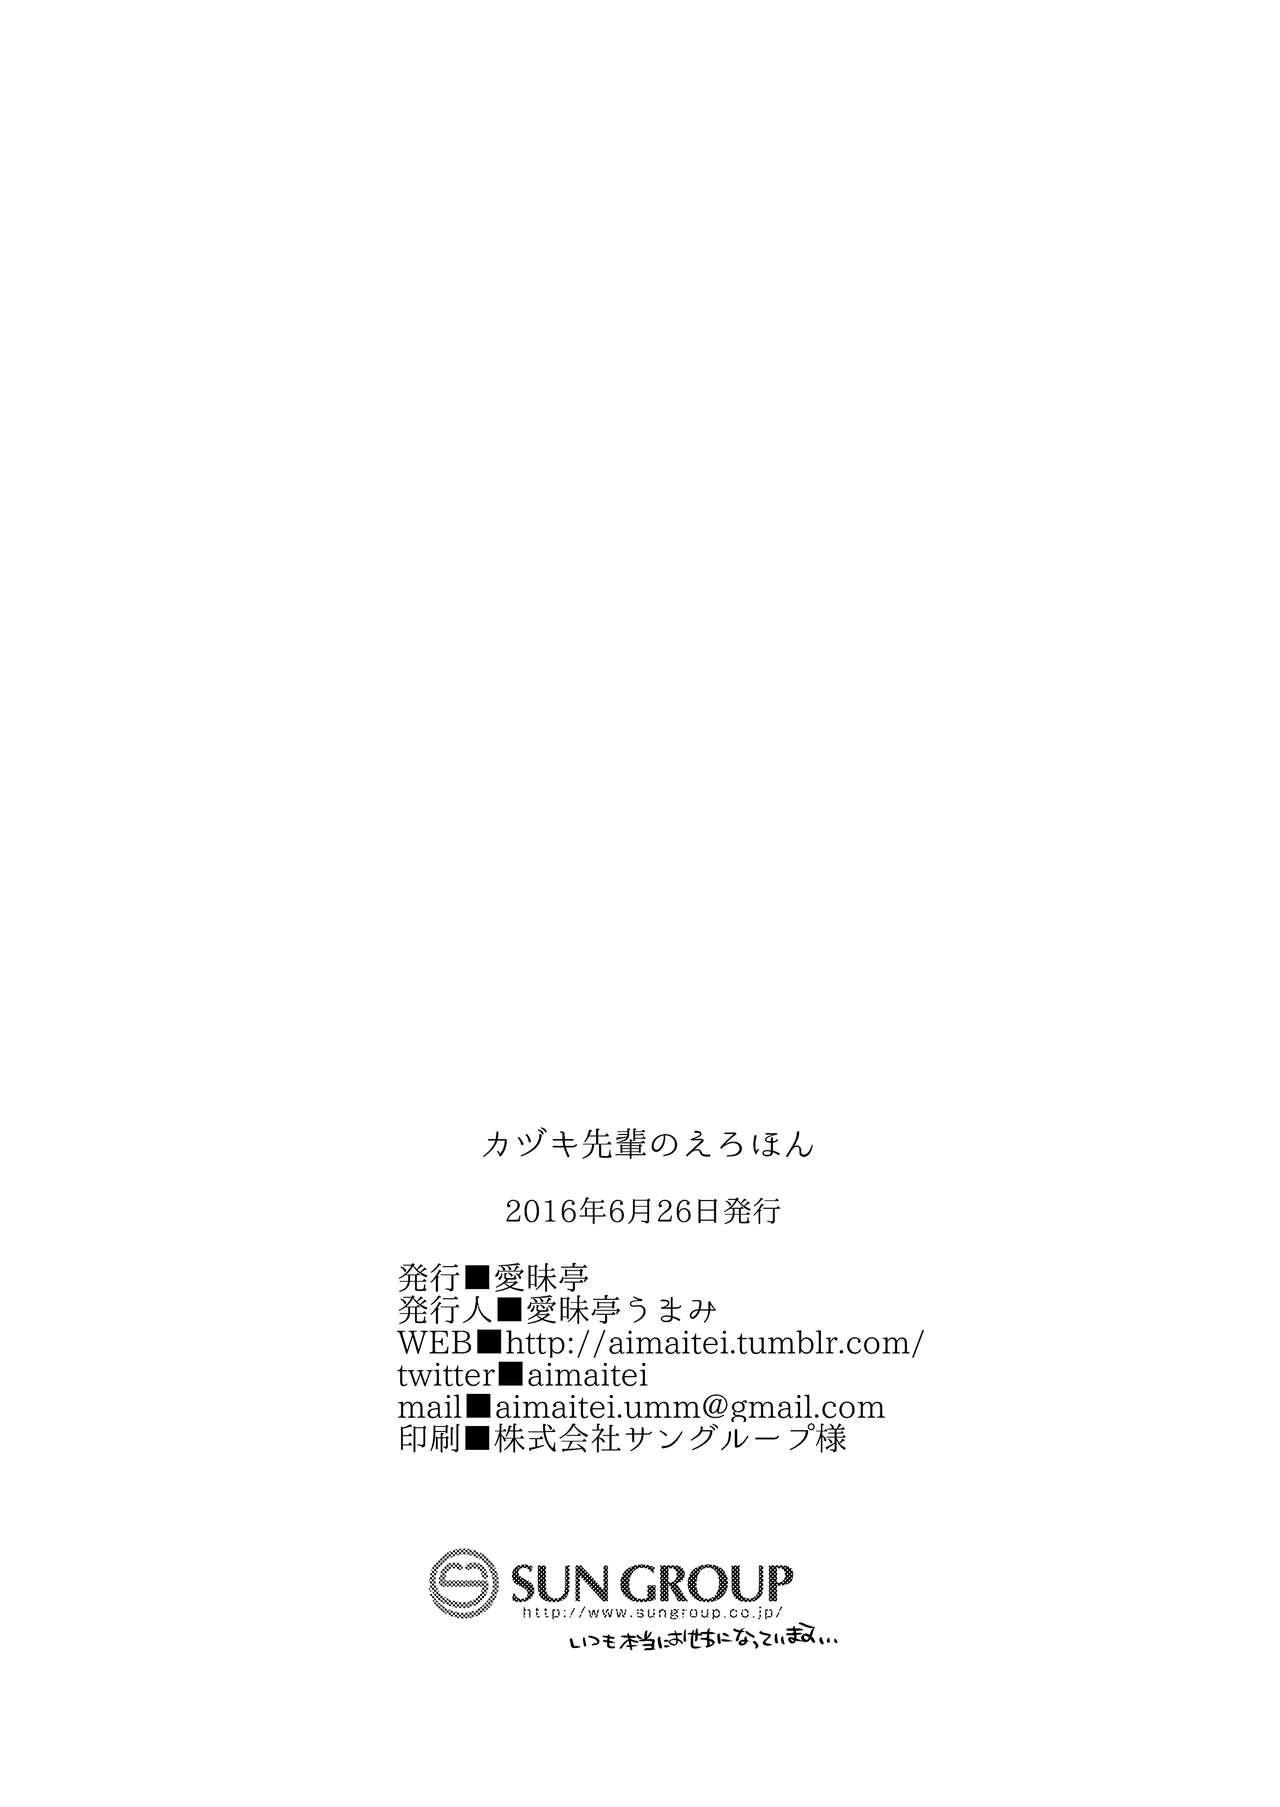 [Aimaitei (Aimaitei Umami)] Kazuki-senpai no Ero Hon   Kazuki-senpai's Erotic Book (King of Prism by Pretty Rhythm) [English] {CapableScoutMan & B.E.C. Scans} [Digital] 25